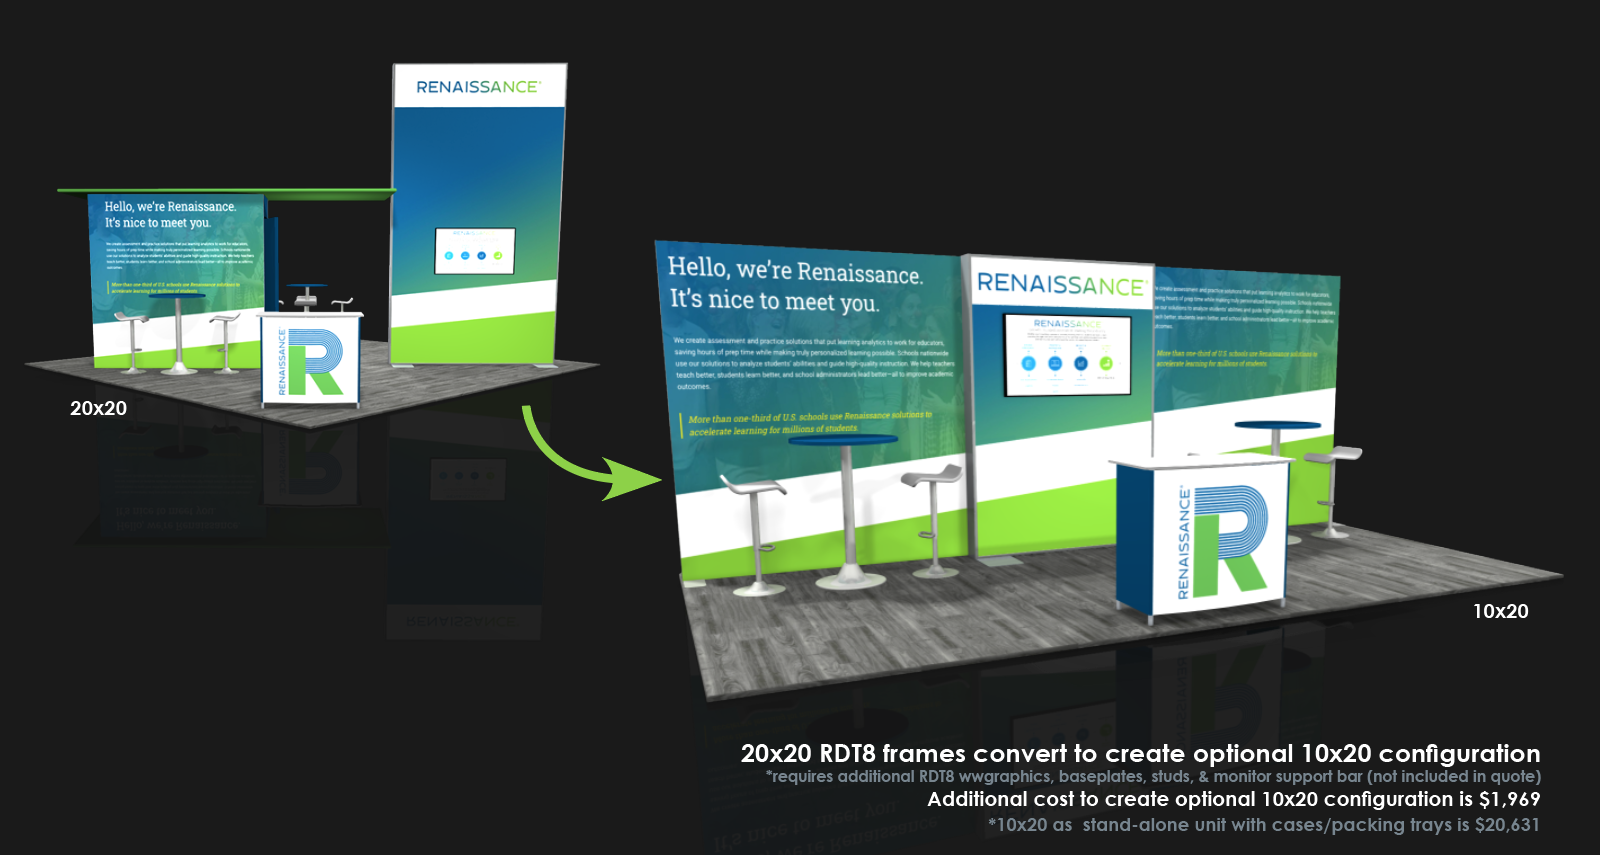 20x20 modular tool-less trade show display converts to 10x20